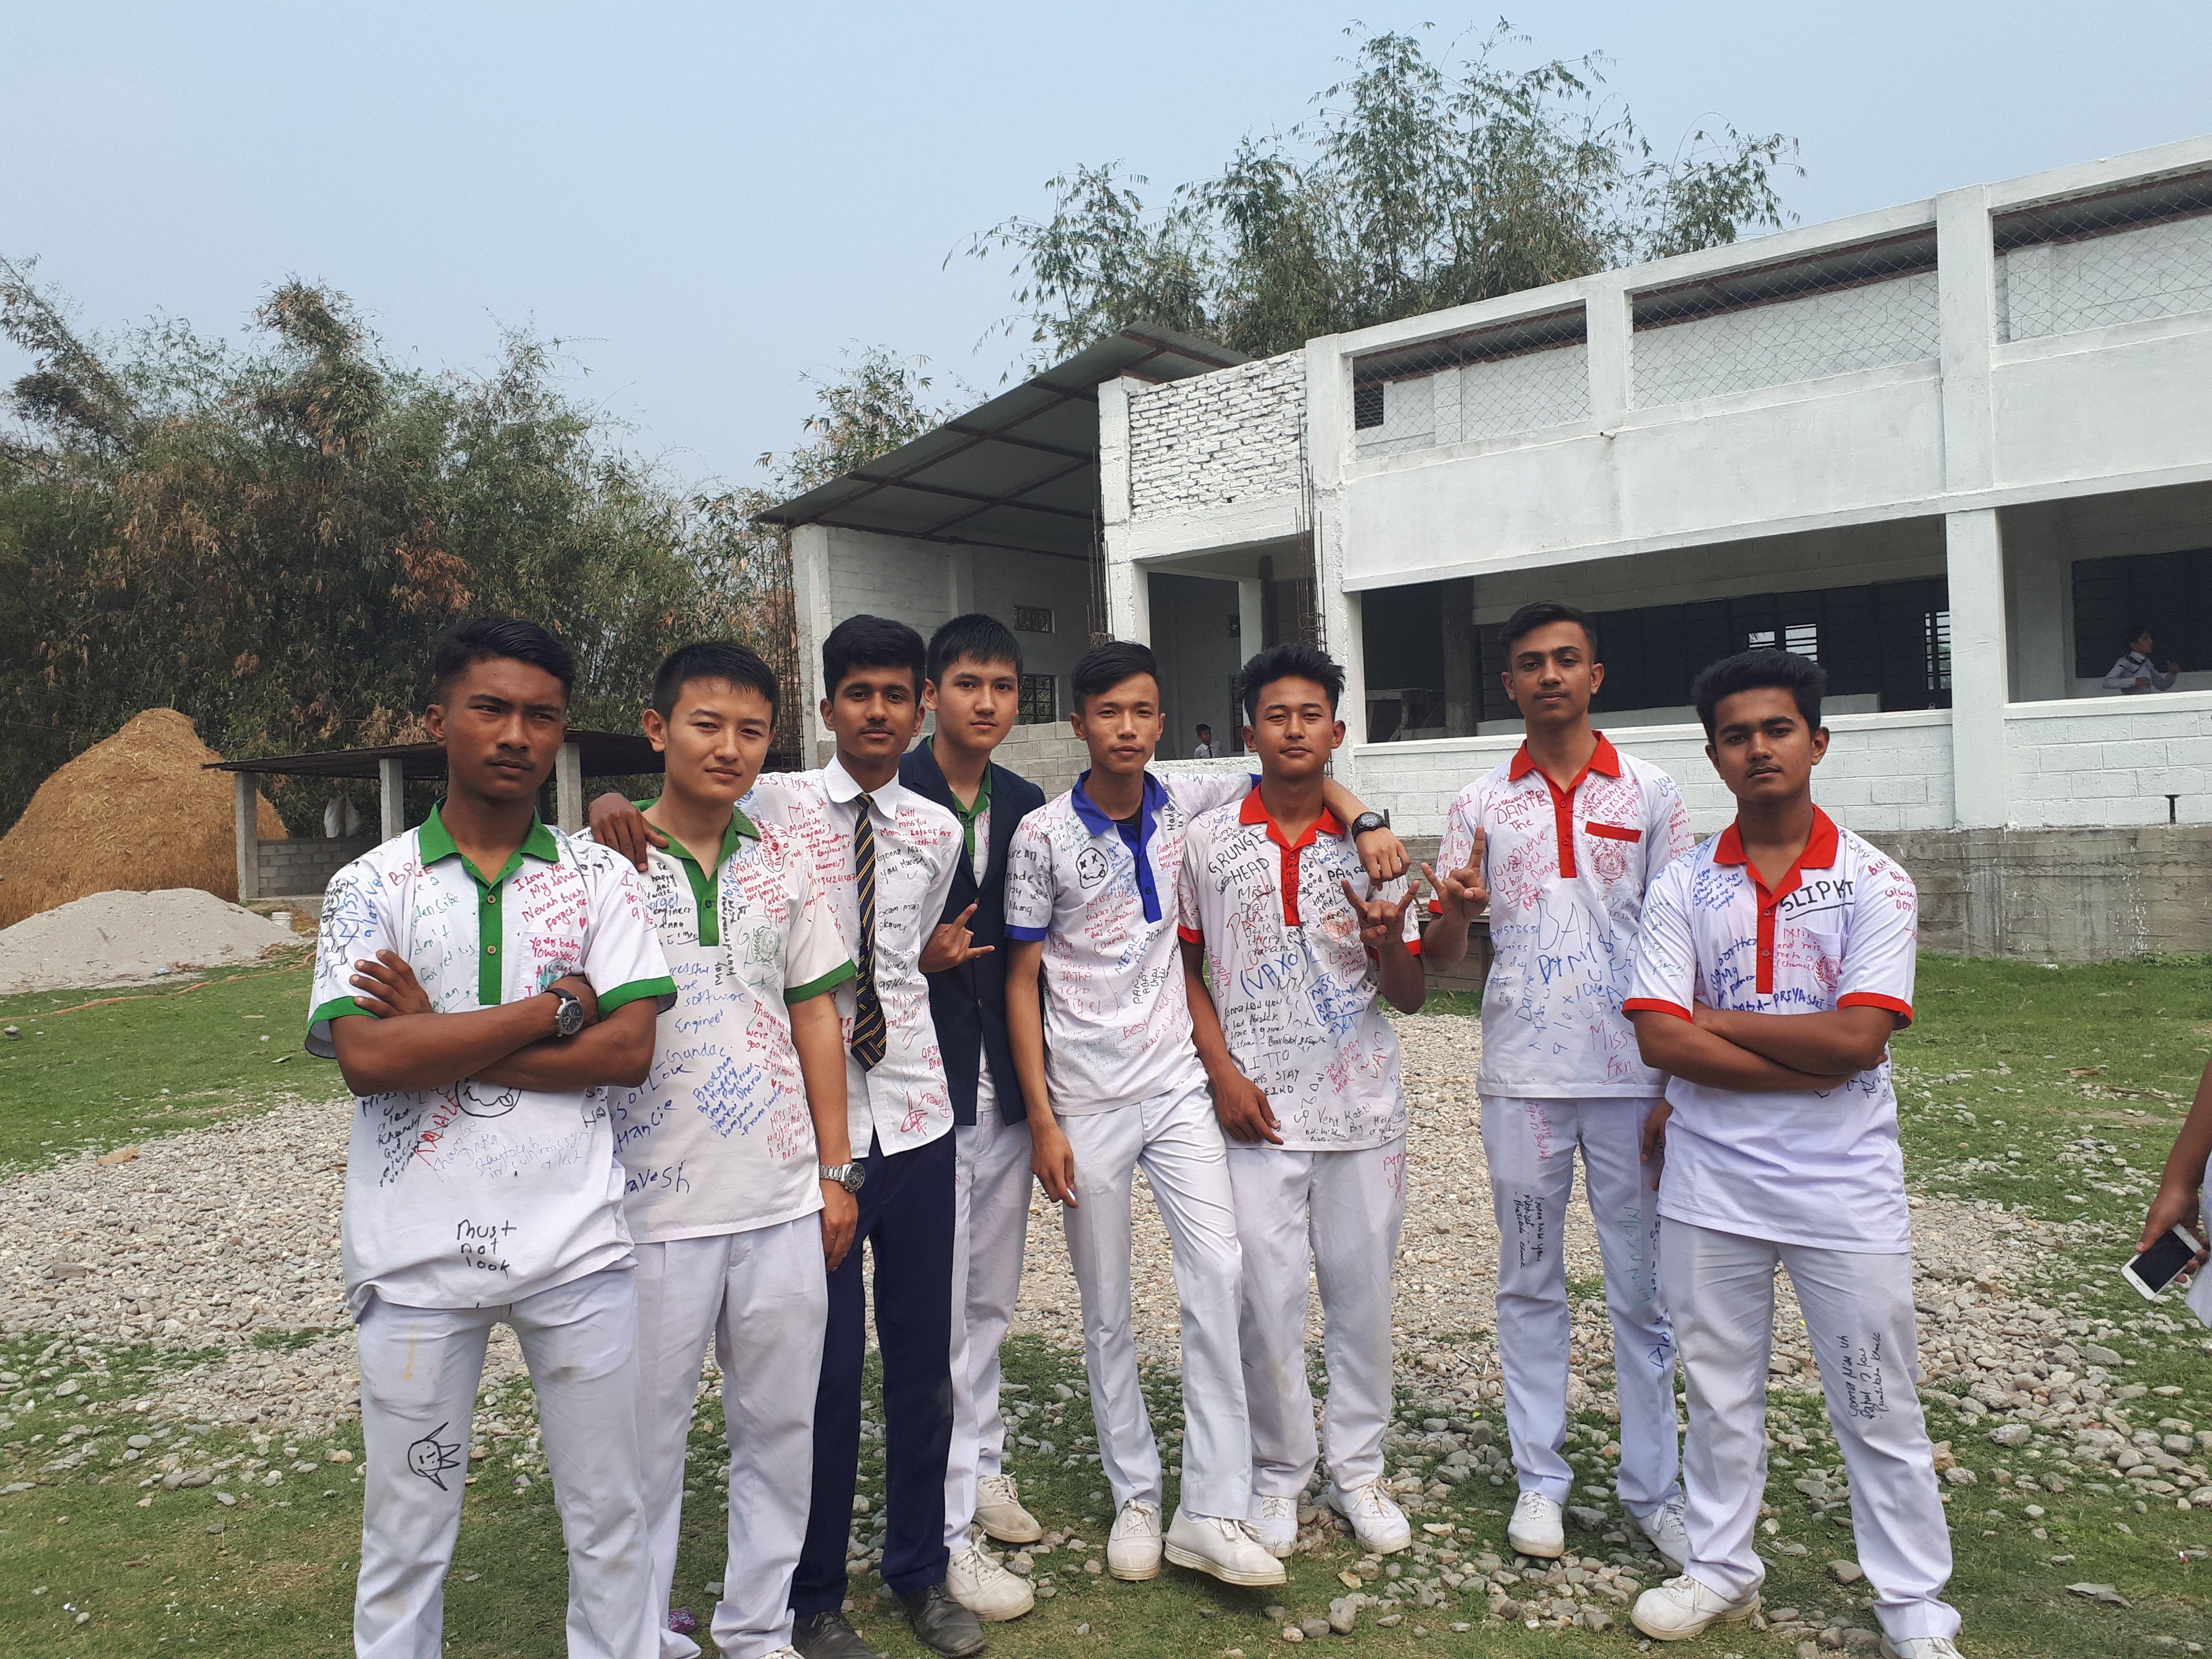 Hancie Wanem Phago | Siddhartha Shishu Sadan school bhadrapur